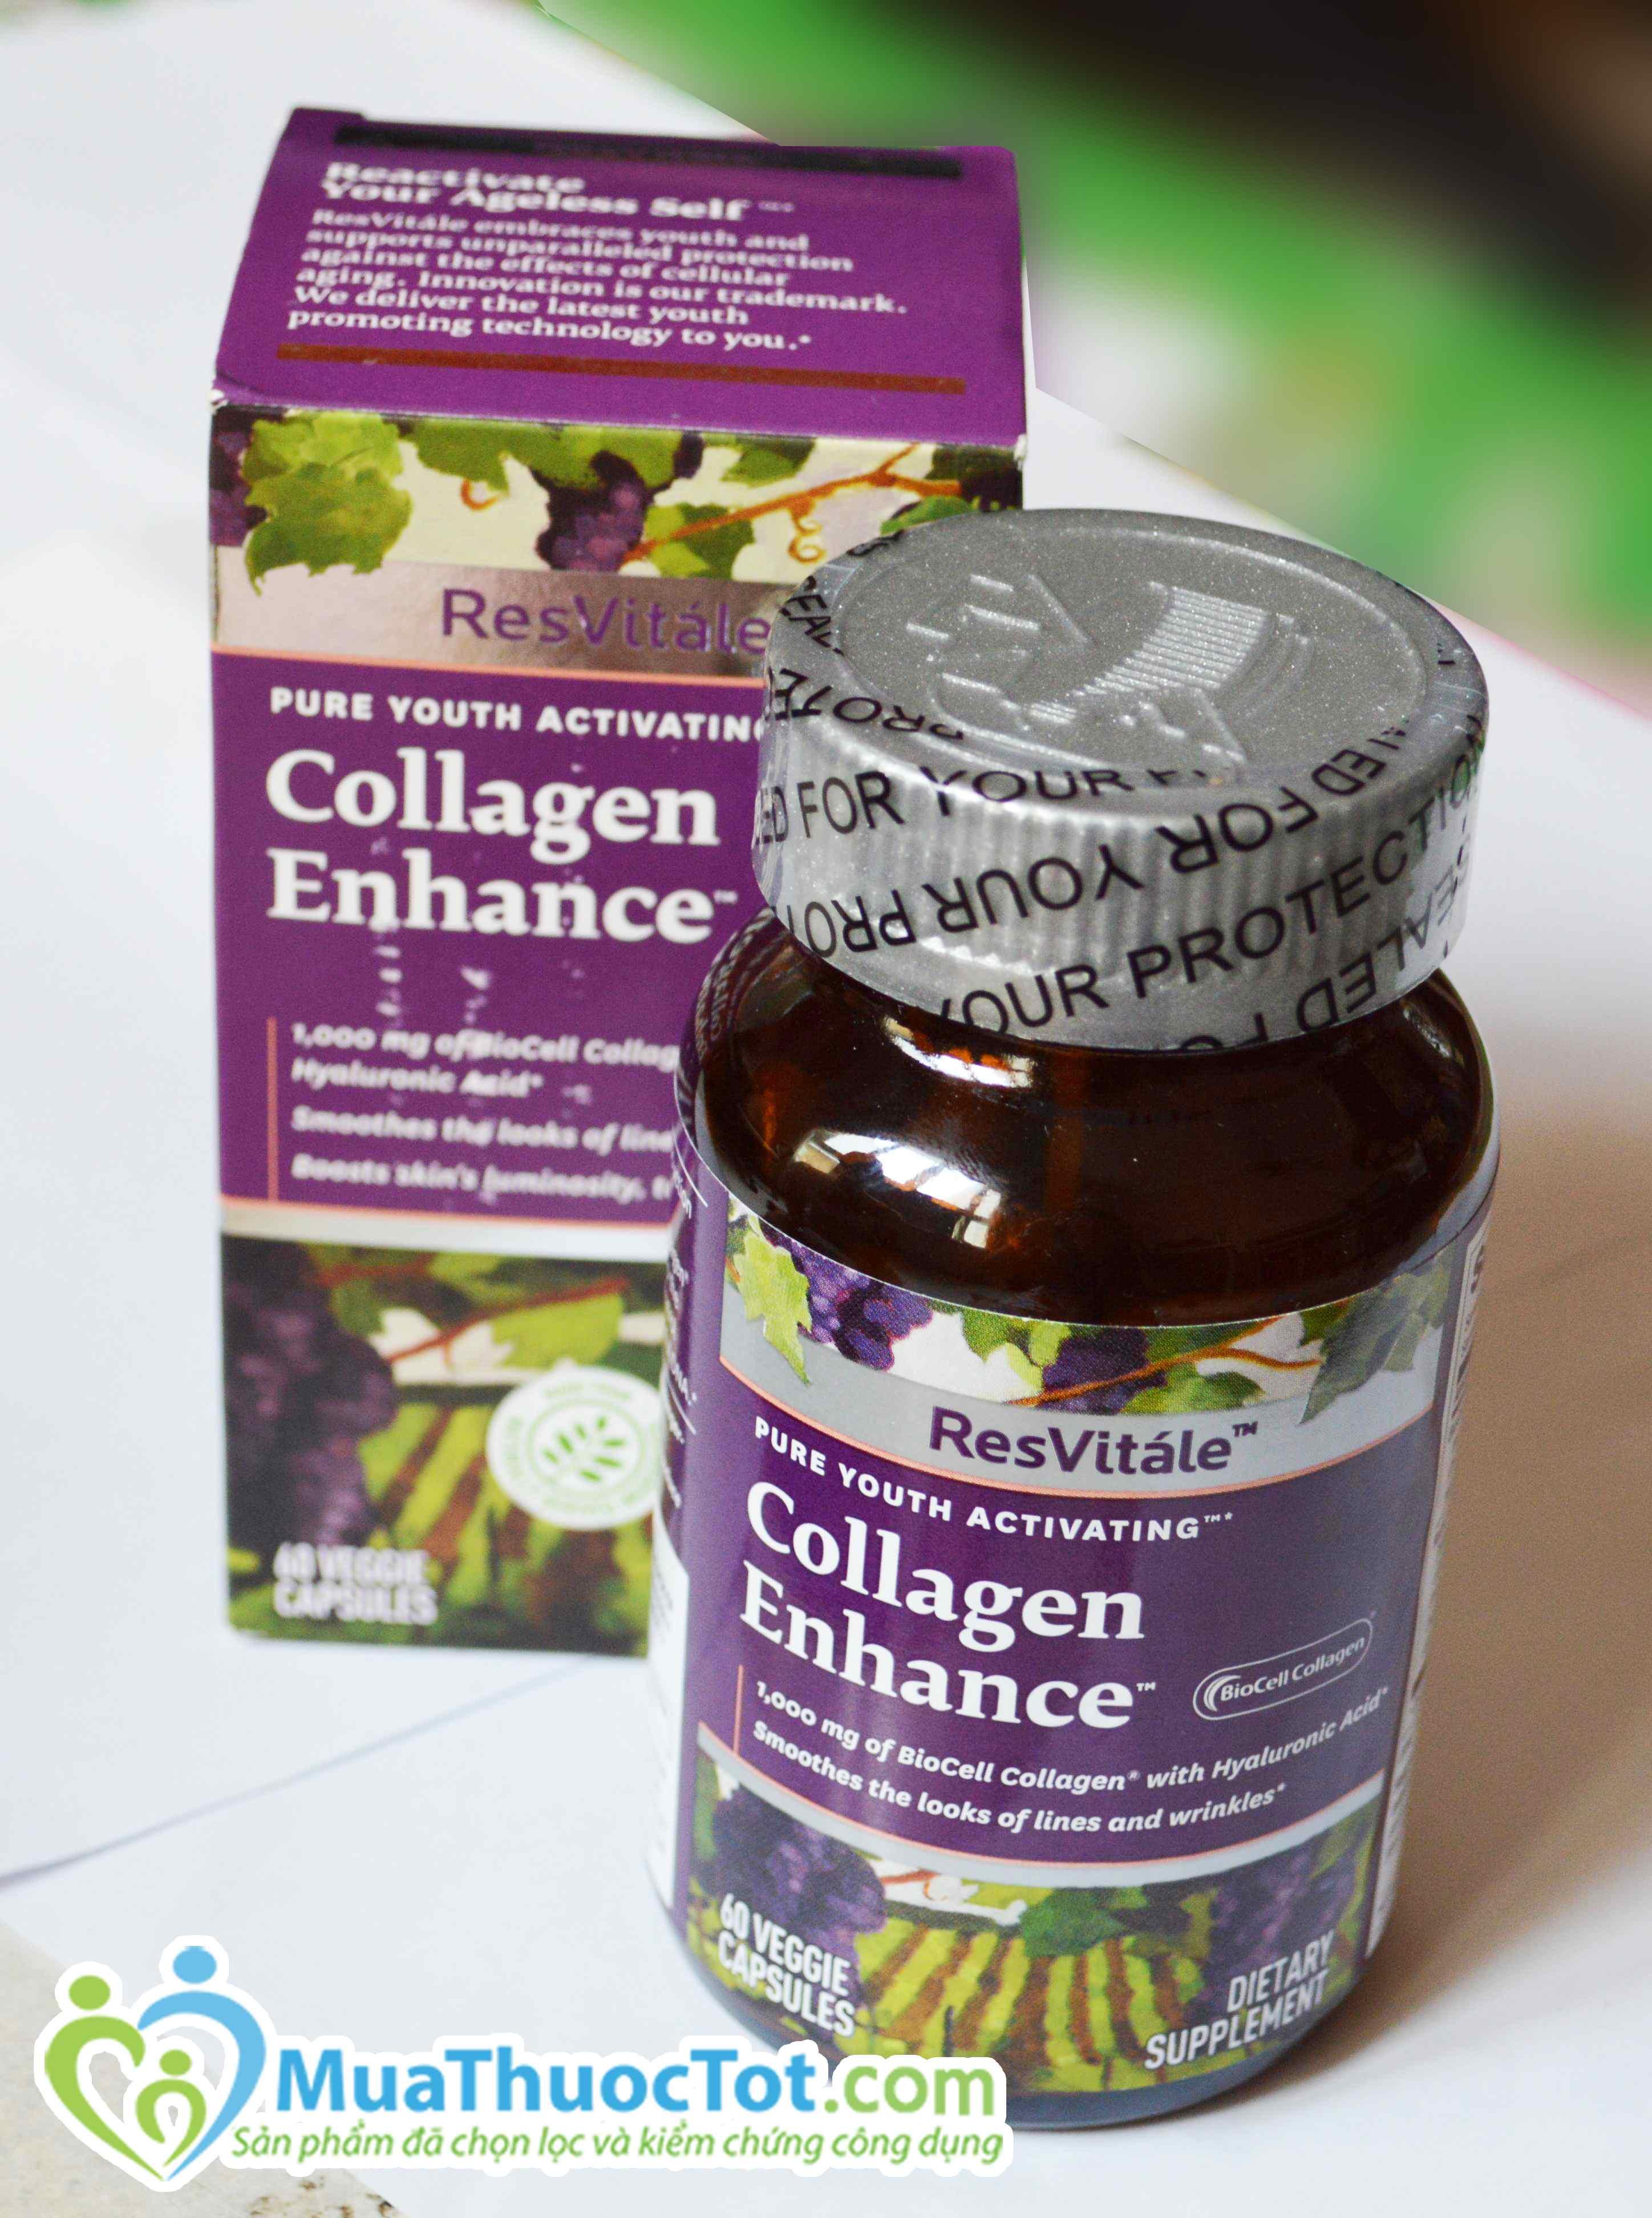 1. thuốc bổ sung collagen làm đẹp da gnc resvitále™ collagen enhance có tốt không